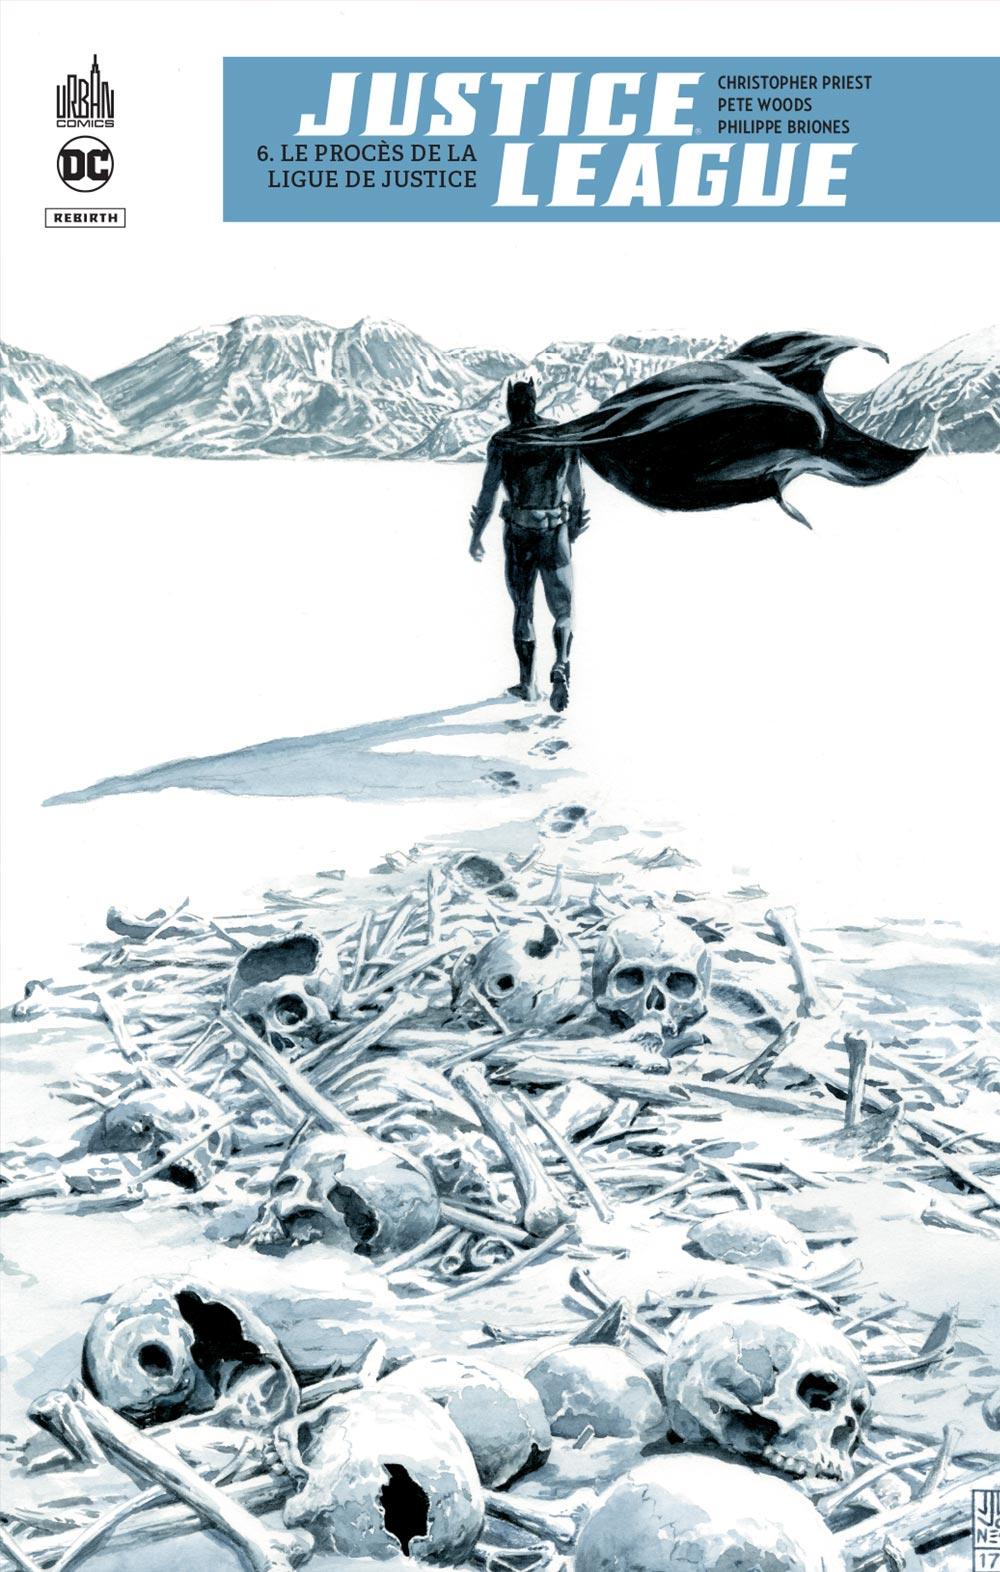 Justice League Rebirth 6 - Le procès de la Ligue de Justice